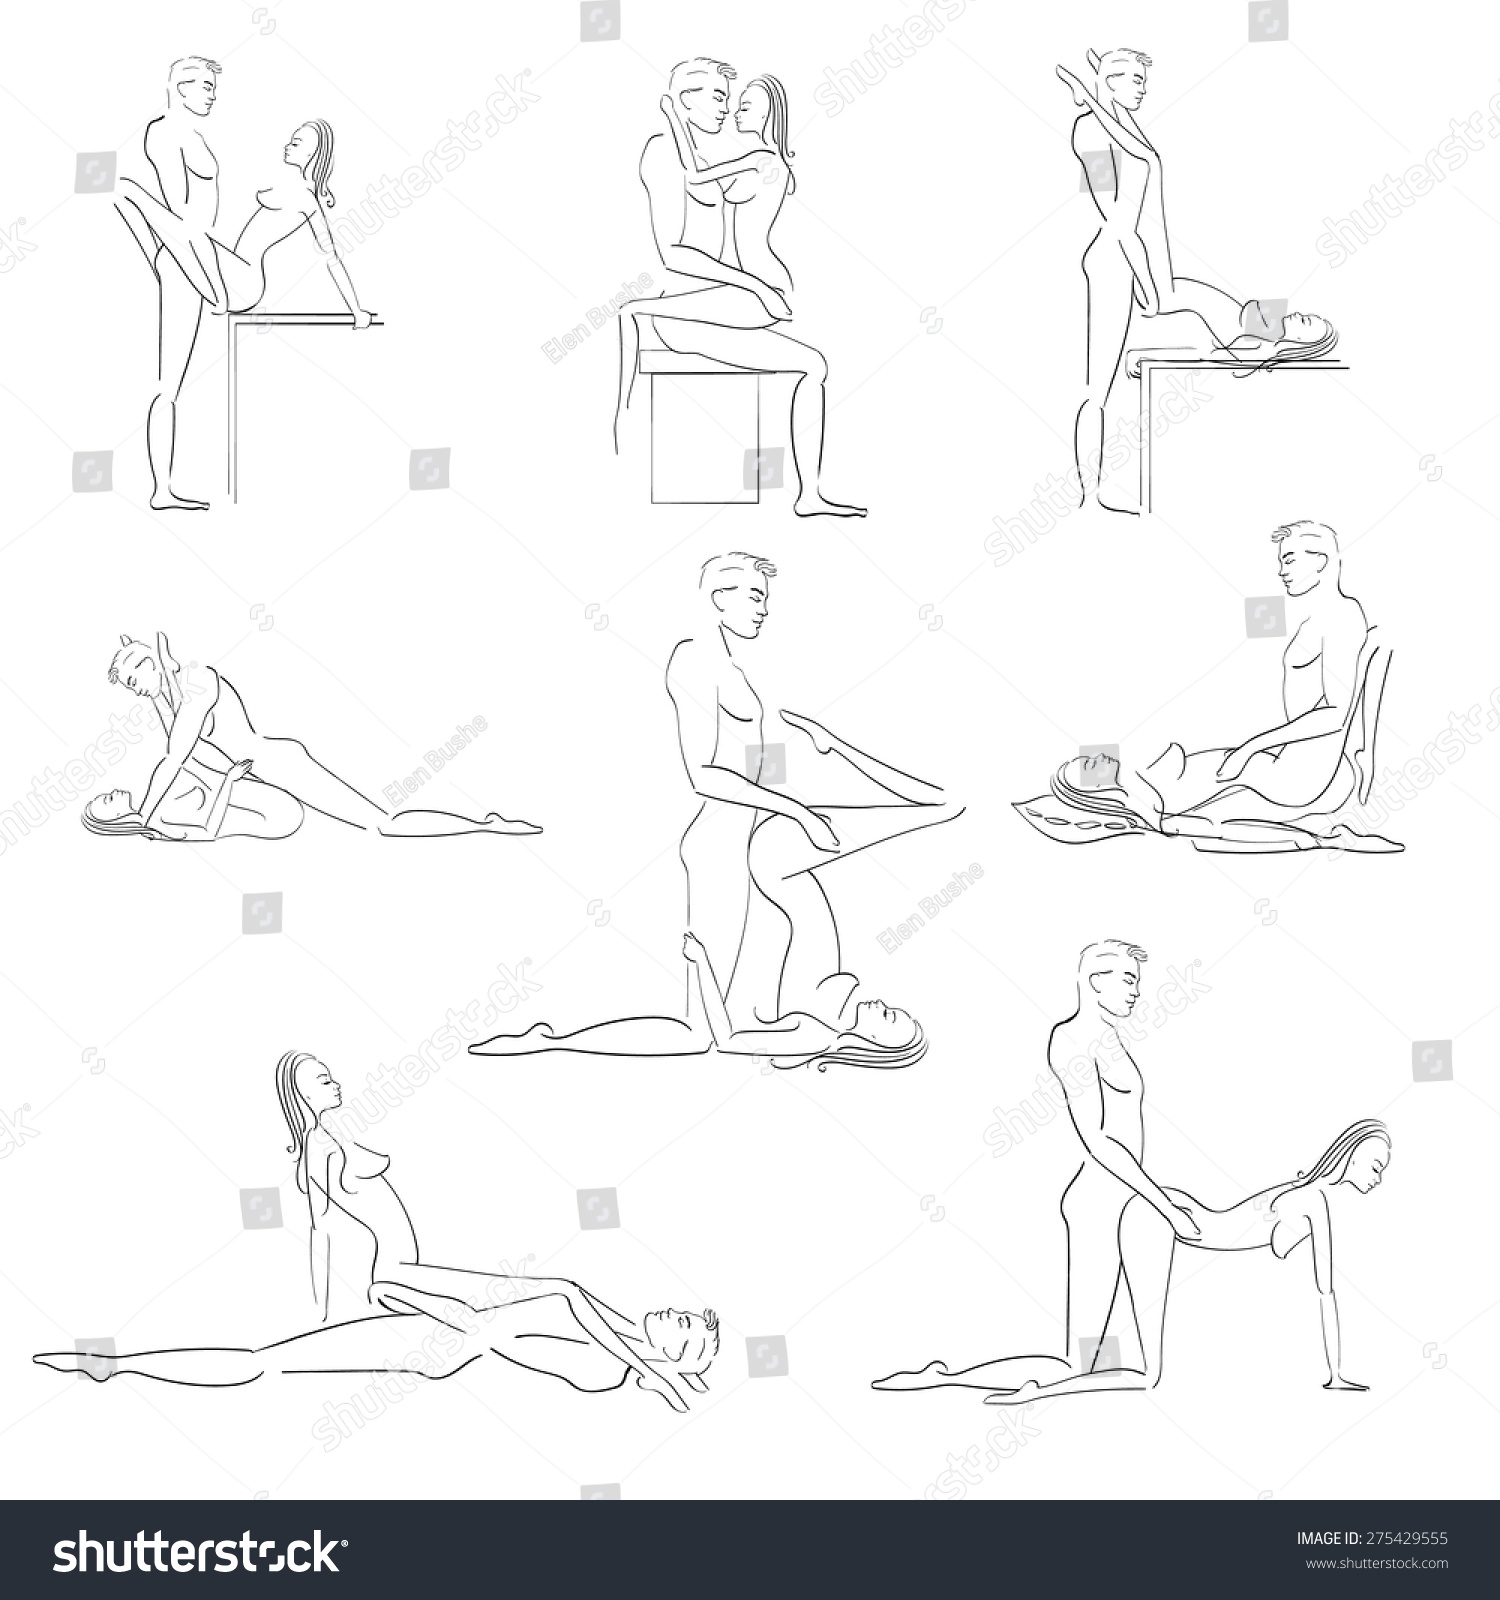 Naked zelda and peach having sex